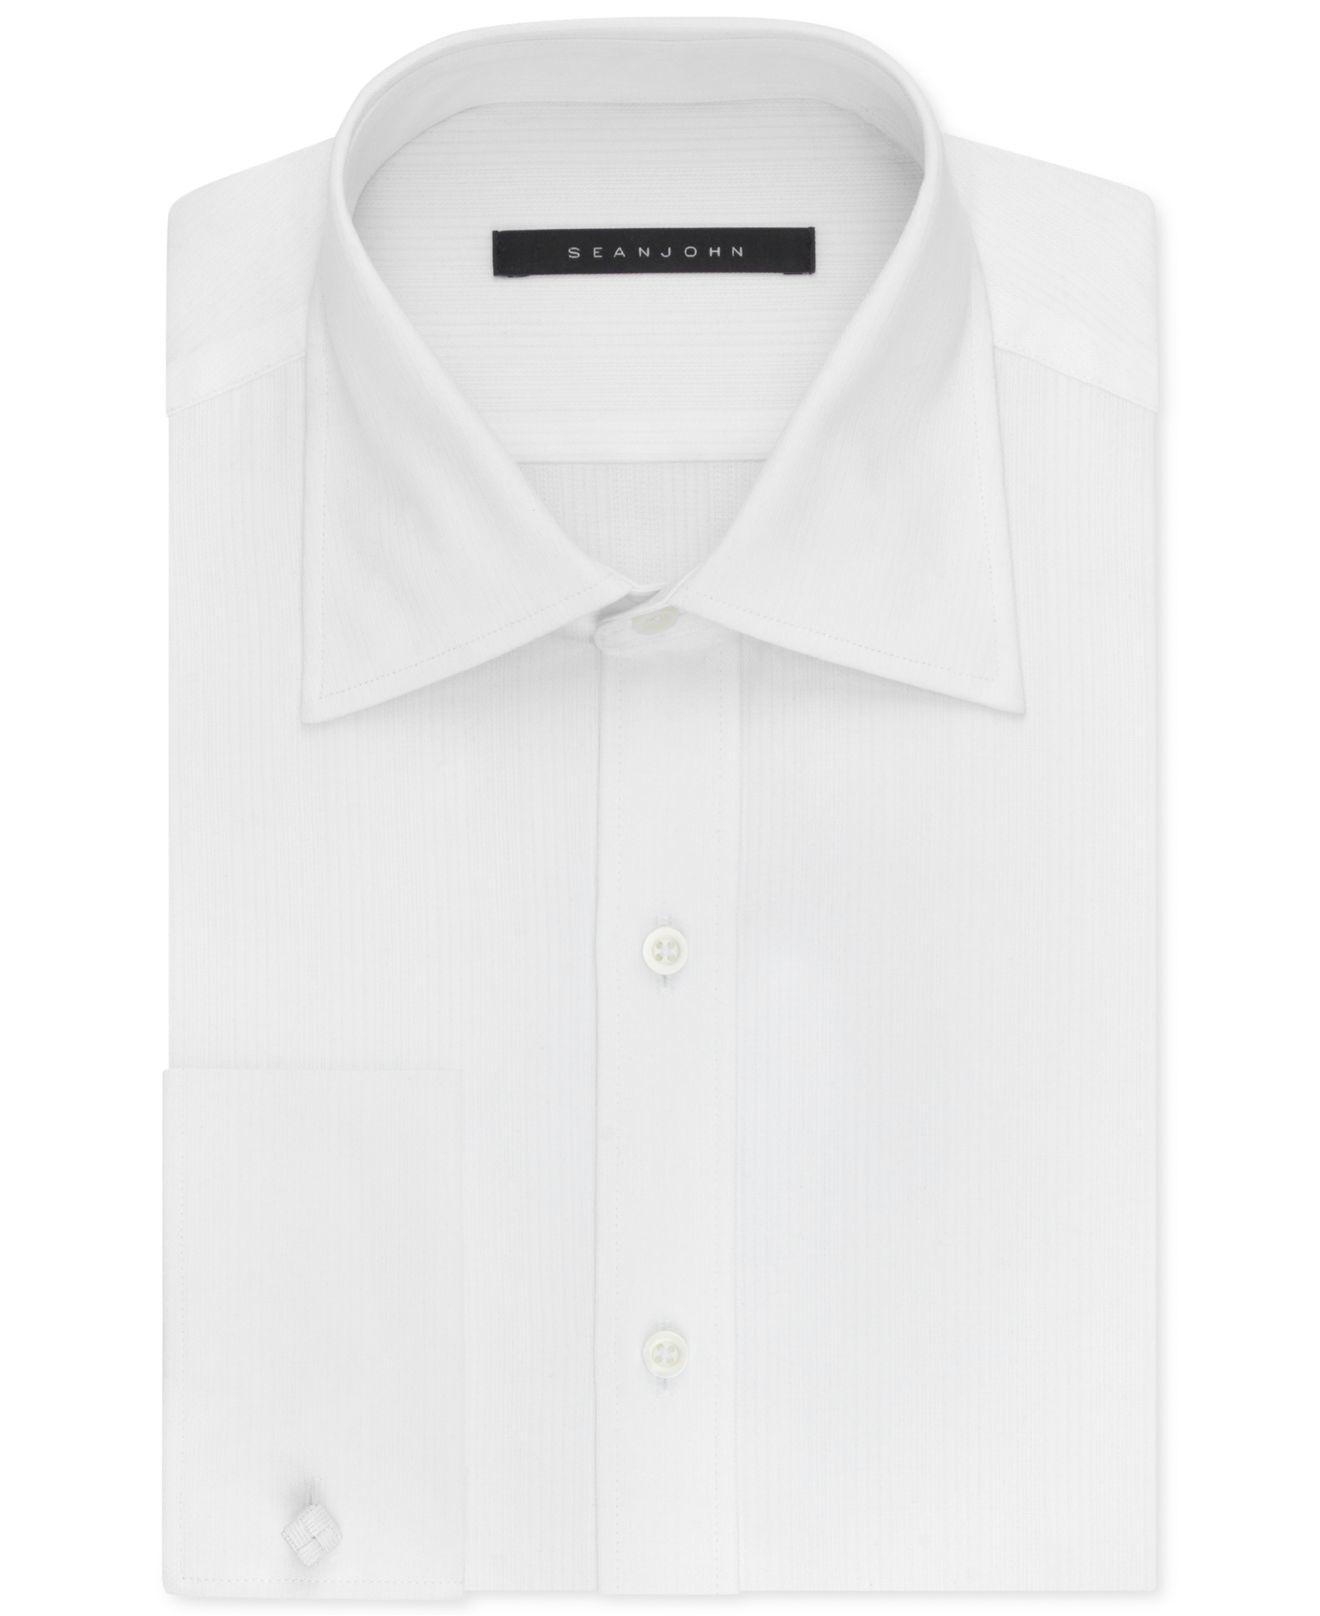 Sean john big and tall french cuff shirt in white for men for Big and tall french cuff dress shirts